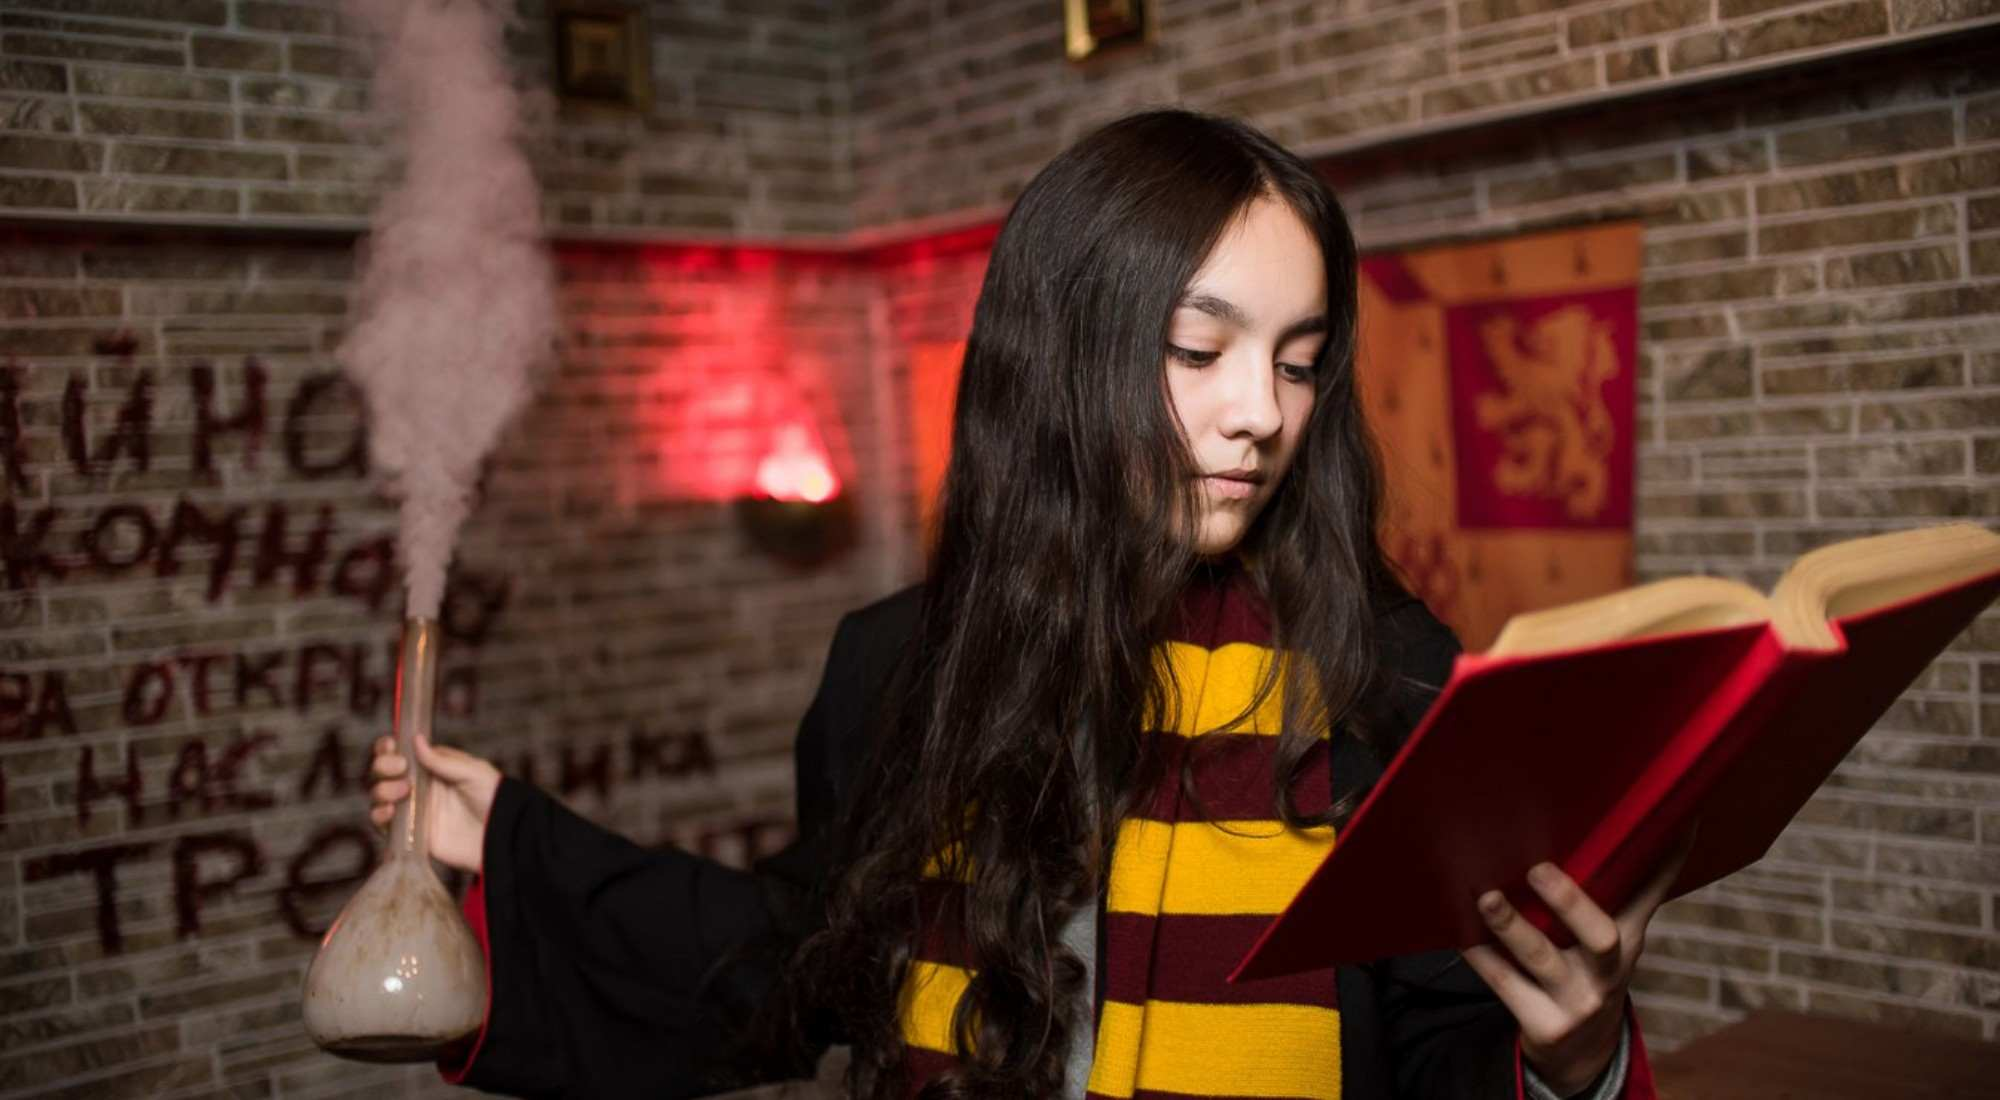 Квест Гарри Поттер и тайная комната в Барнауле фото 0